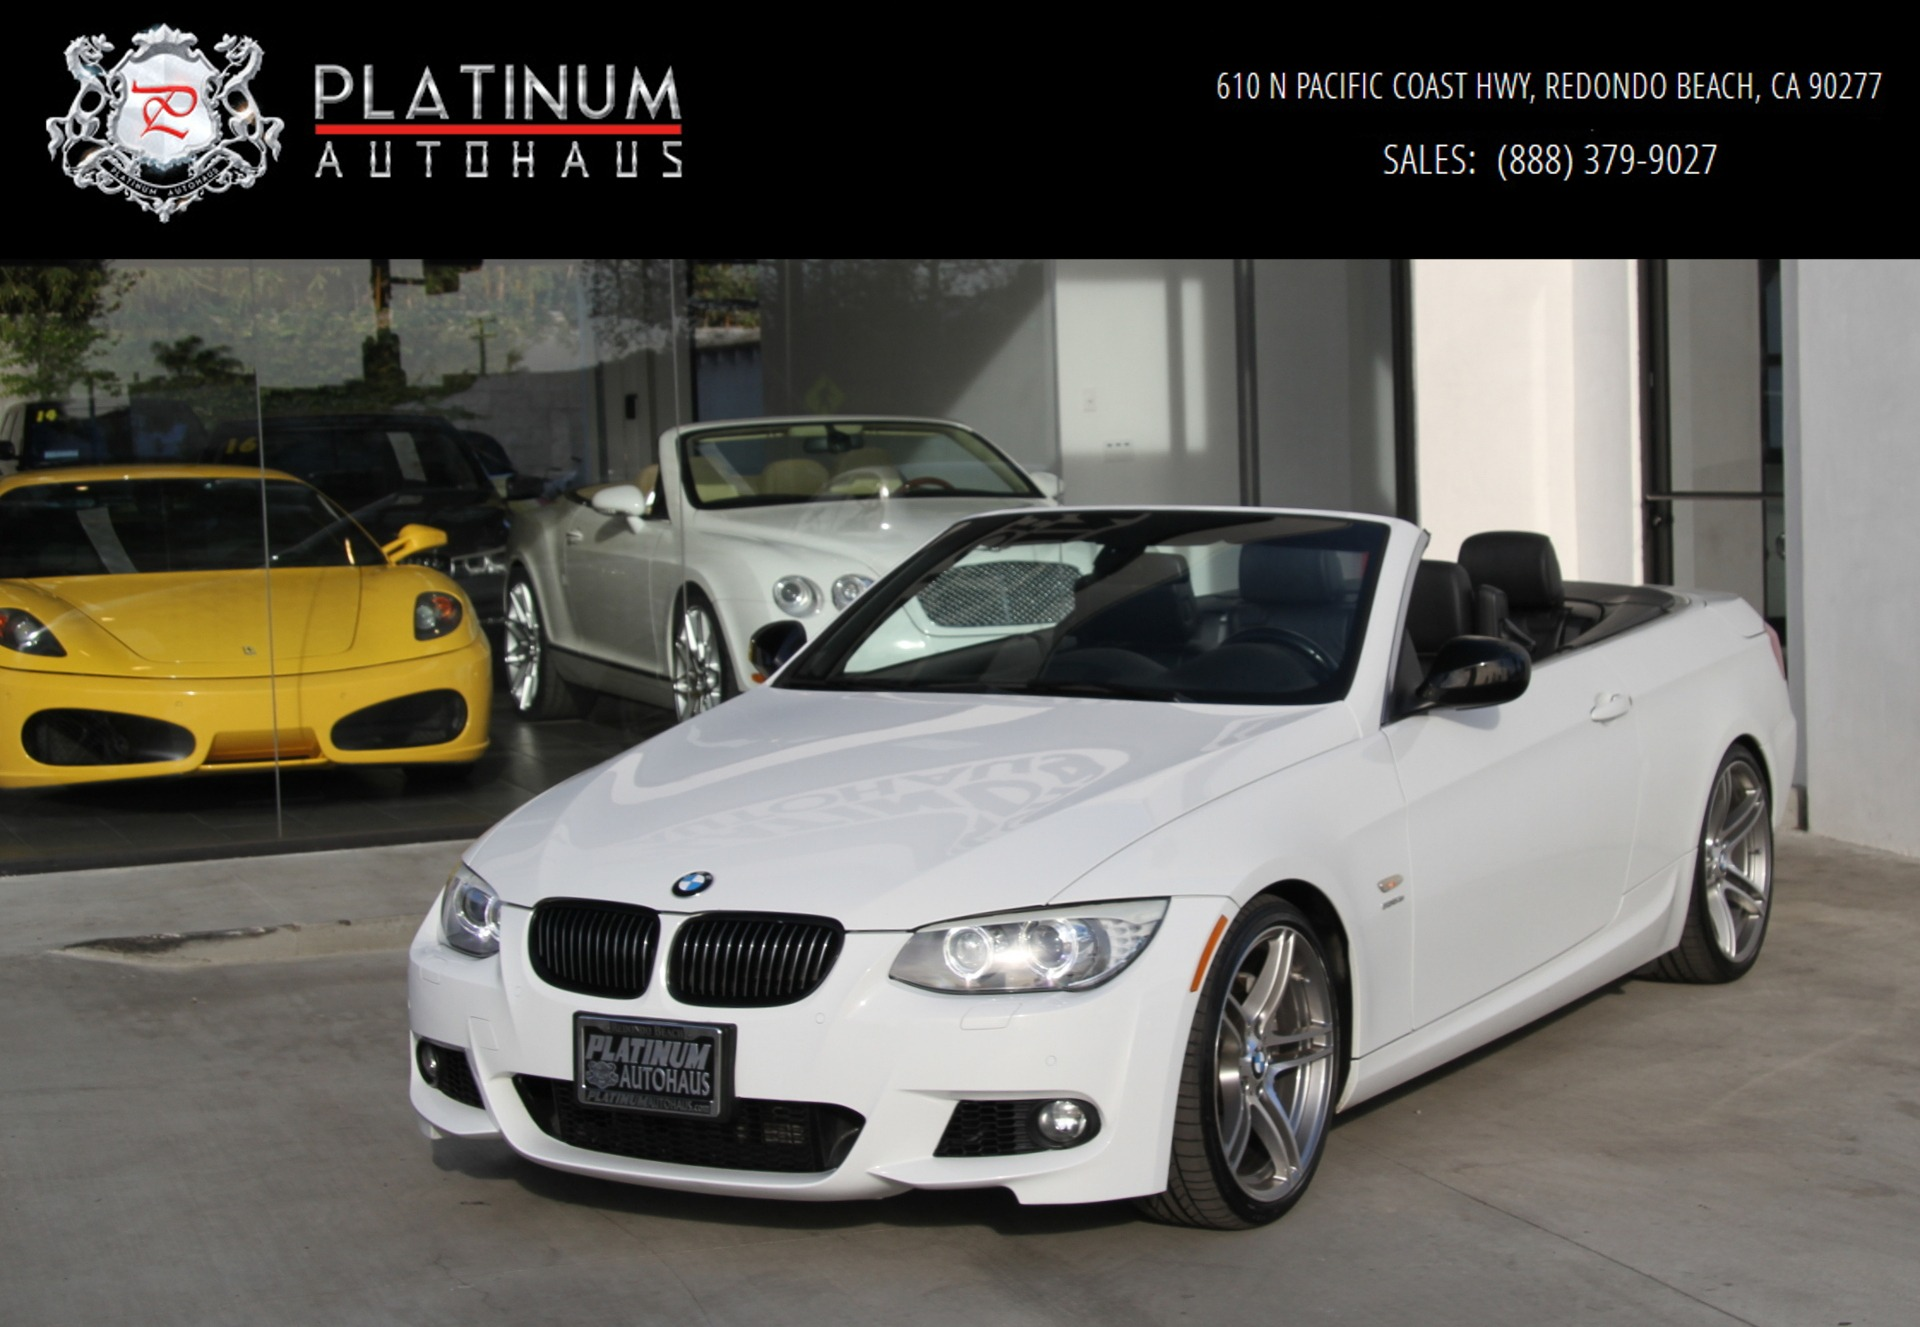 BMW Series Is Stock For Sale Near Redondo Beach - 2012 bmw 335is